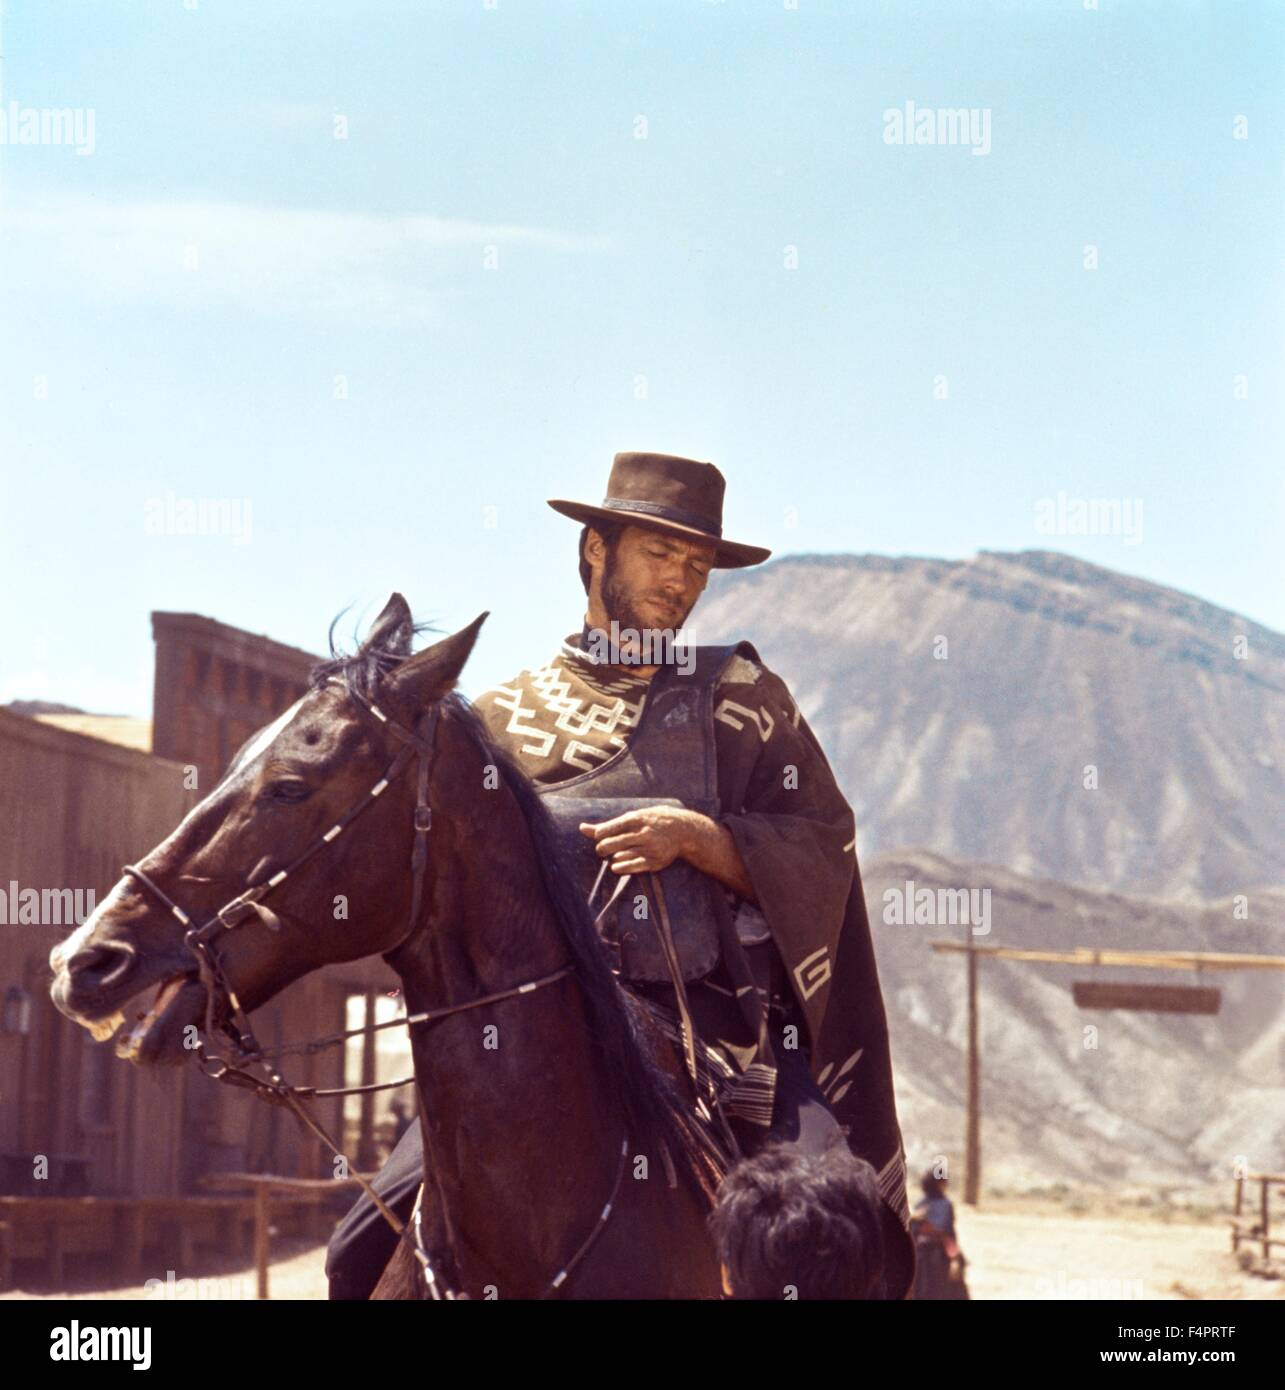 Per Qualche Dollari In Piu / For A Few Dollars More 1965 Directe / Clint Eastwood [United Artists] - Stock Image